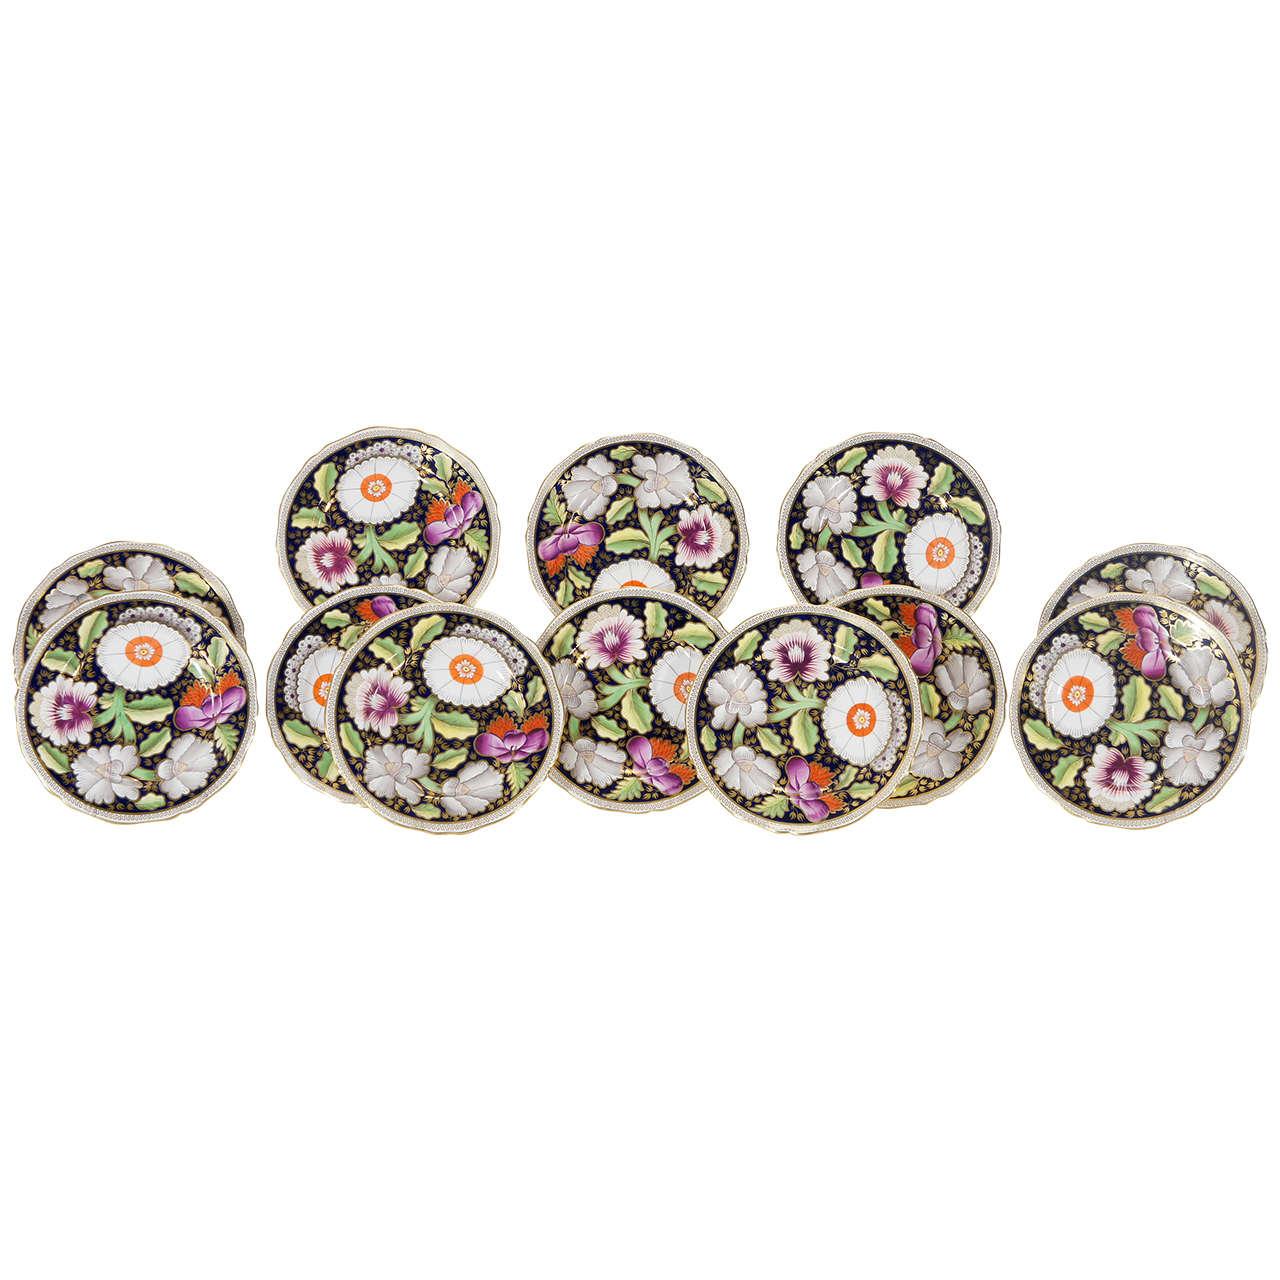 Set of 12 Copelands for Daniel, London Dessert Plates with Imari Decoration